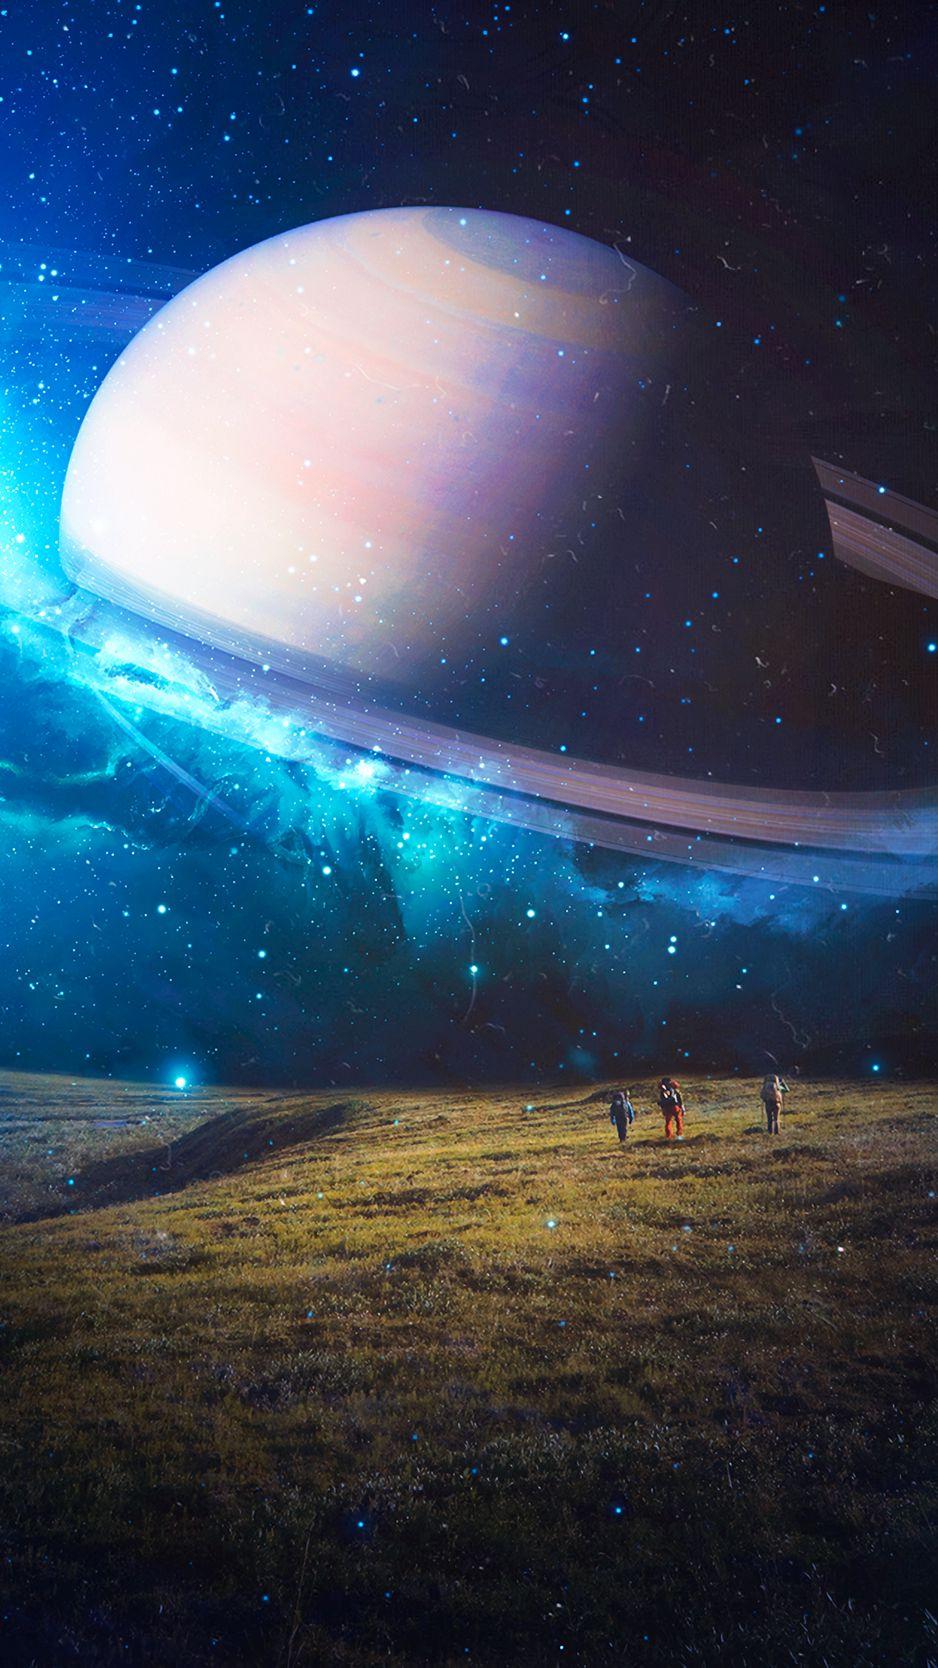 938x1668 Wallpaper space, planet, stars, future